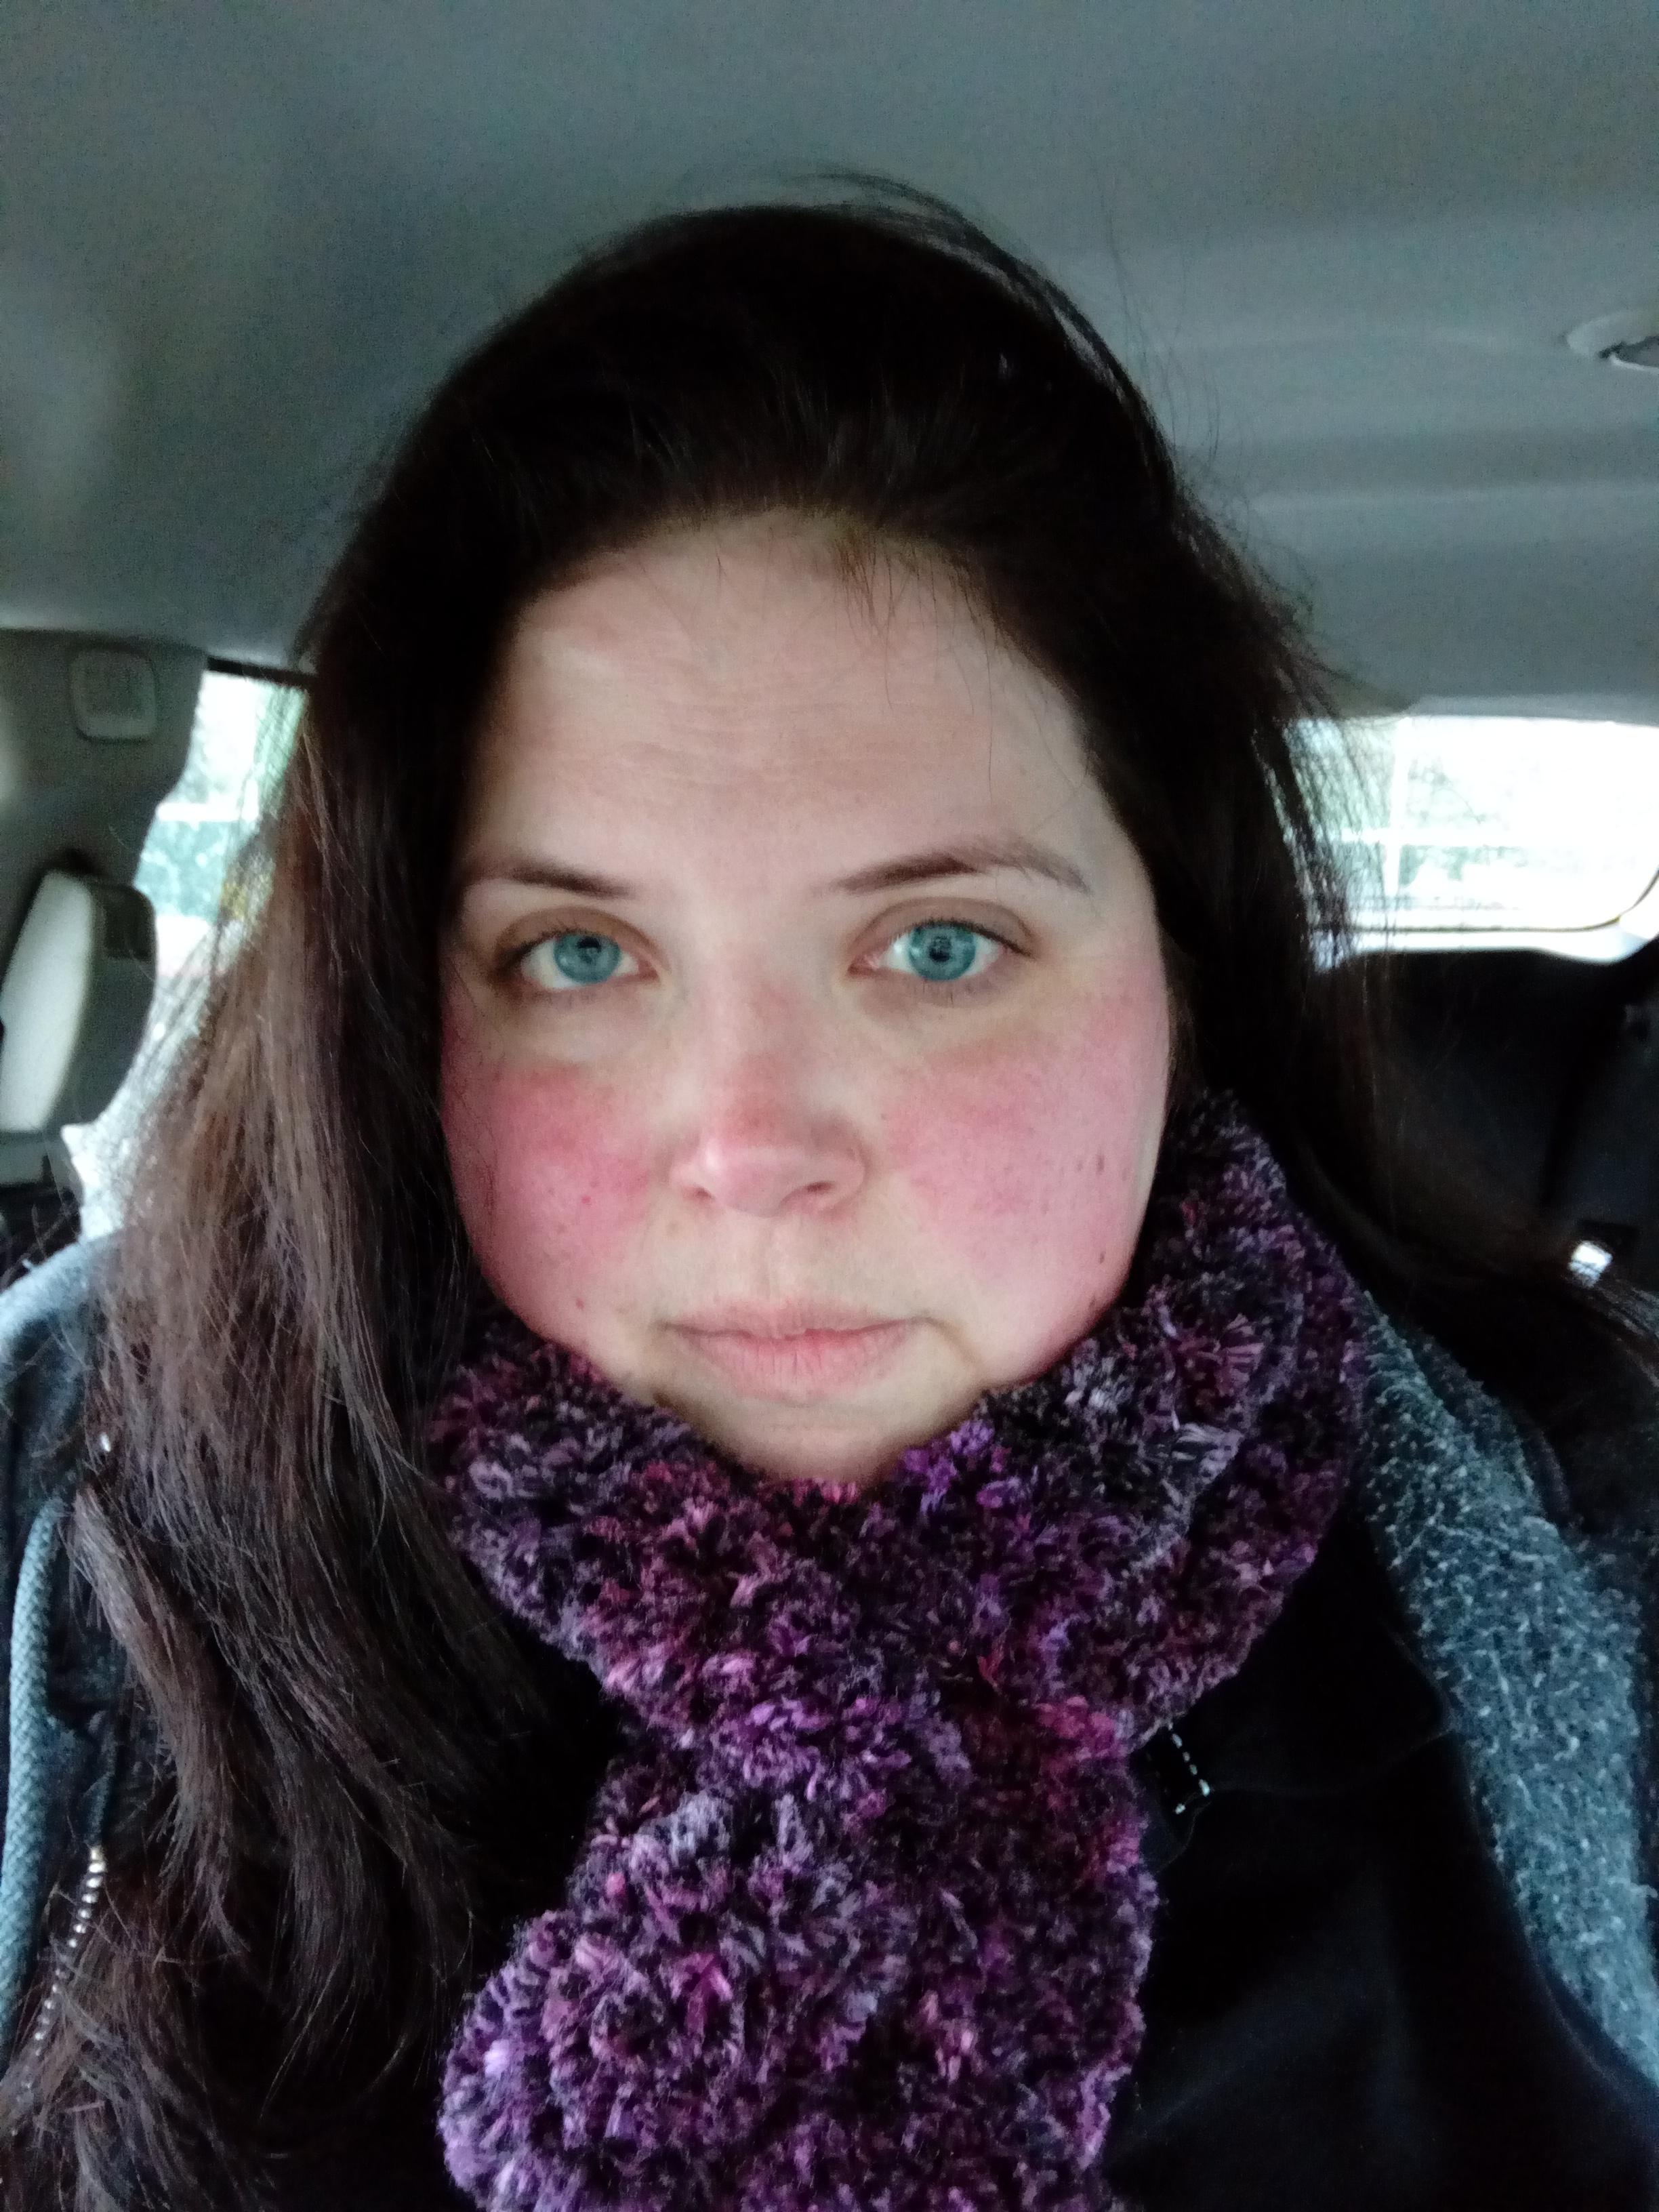 traitement acné antibiotique tetralysal wow